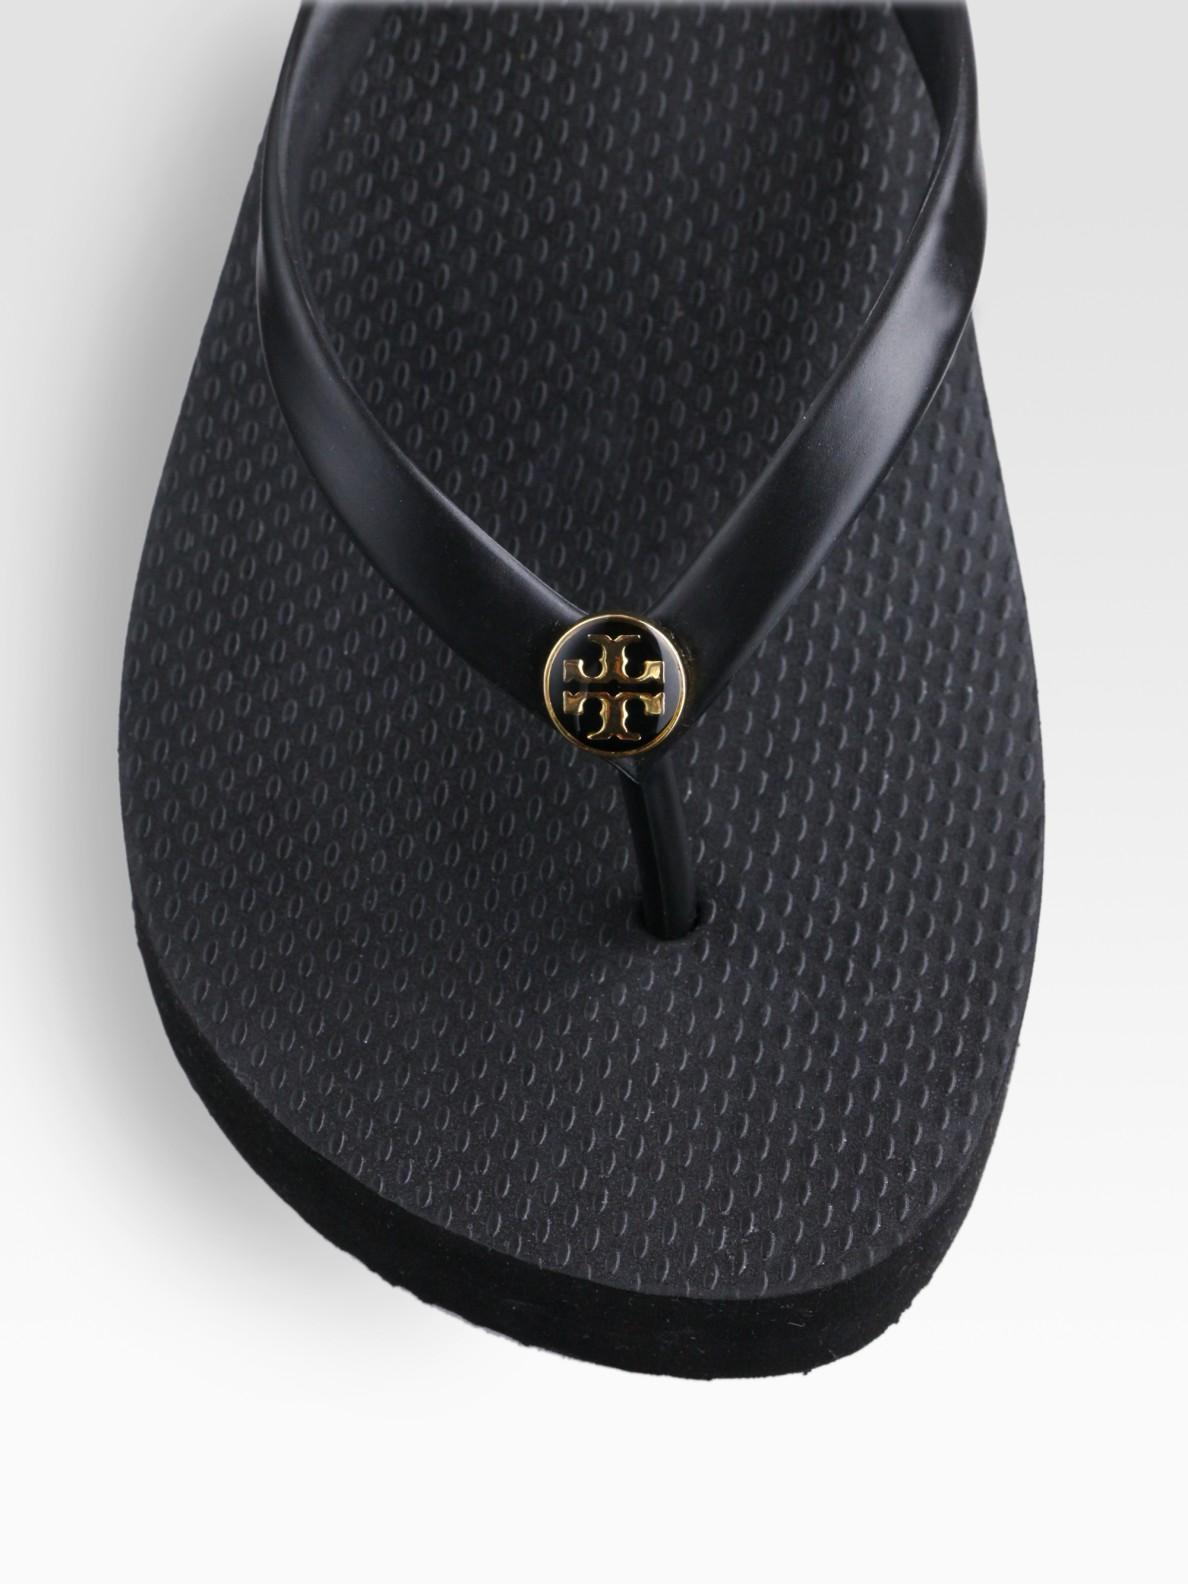 a34bd4e16 Lyst - Tory Burch Logo Thong Flip Flops in Black